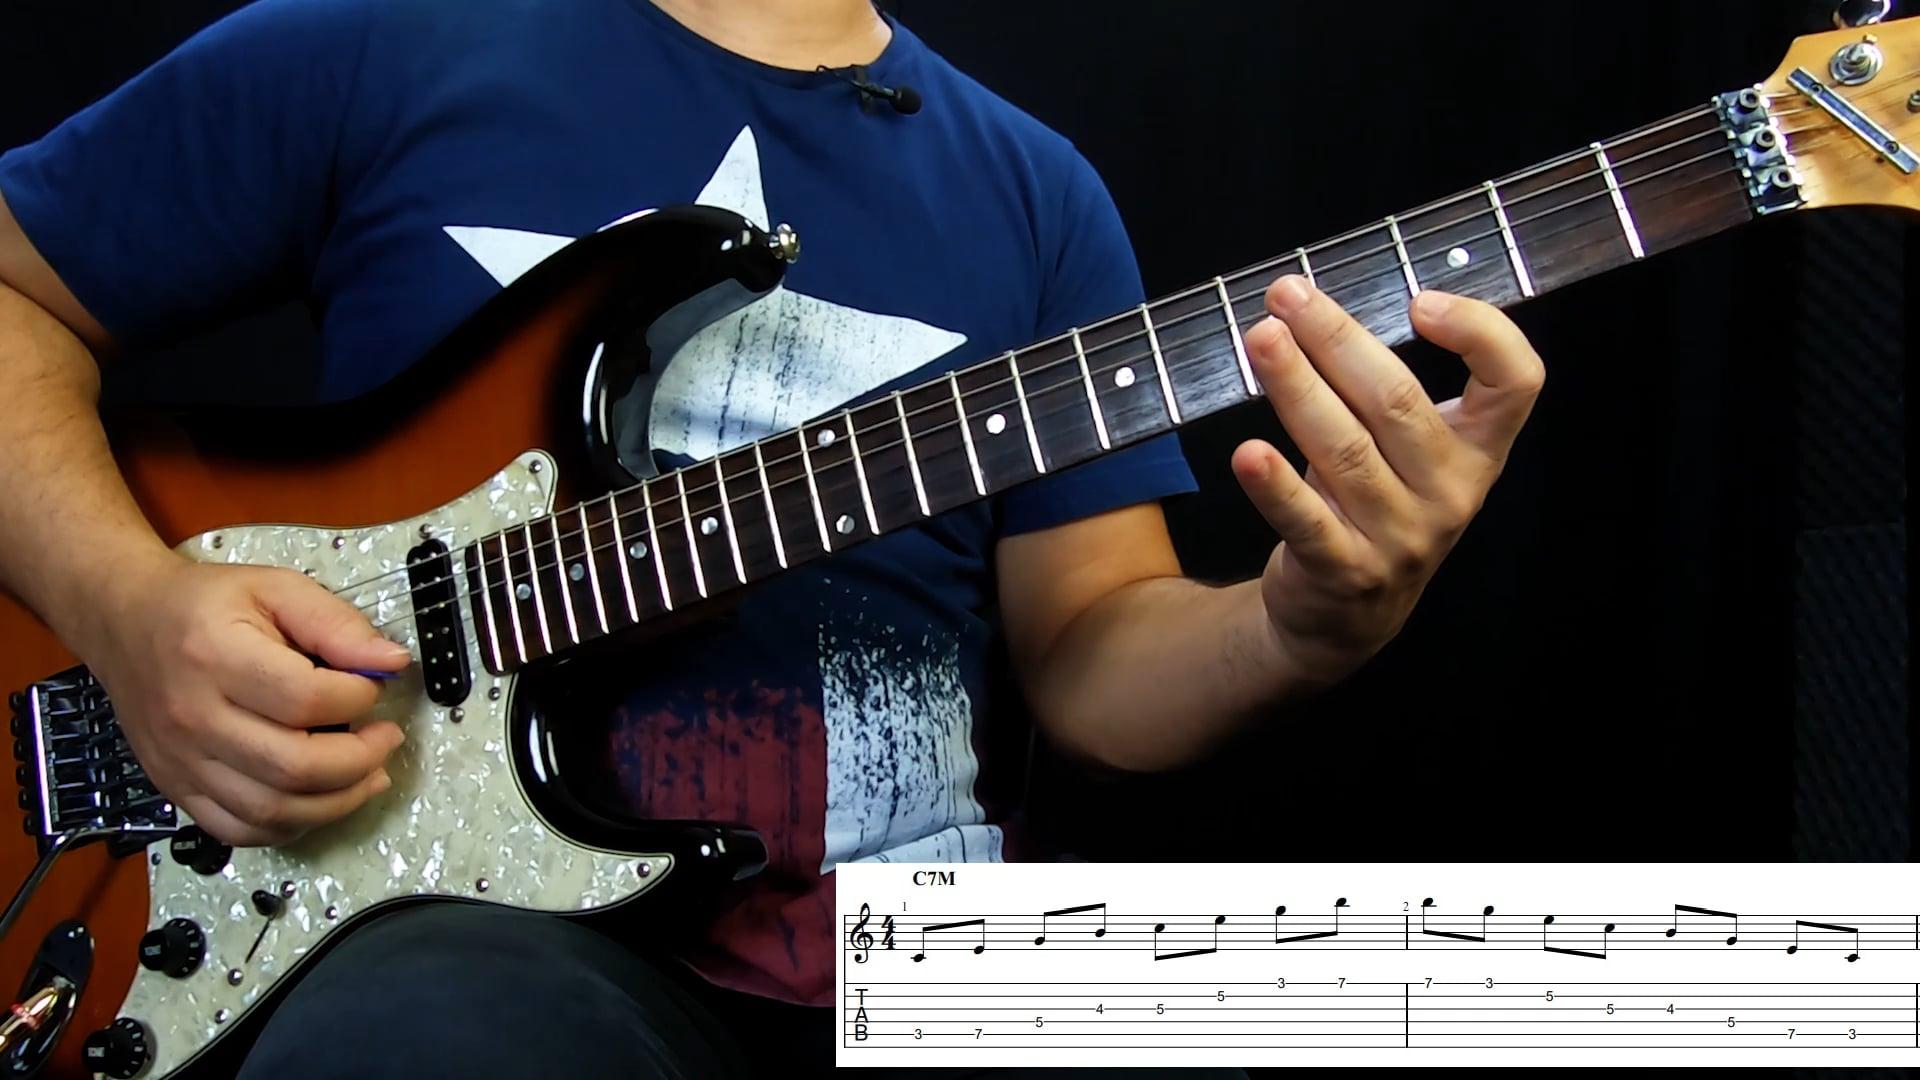 Arpejos Tétrades - Campo harmônico maior C (5ª Corda)